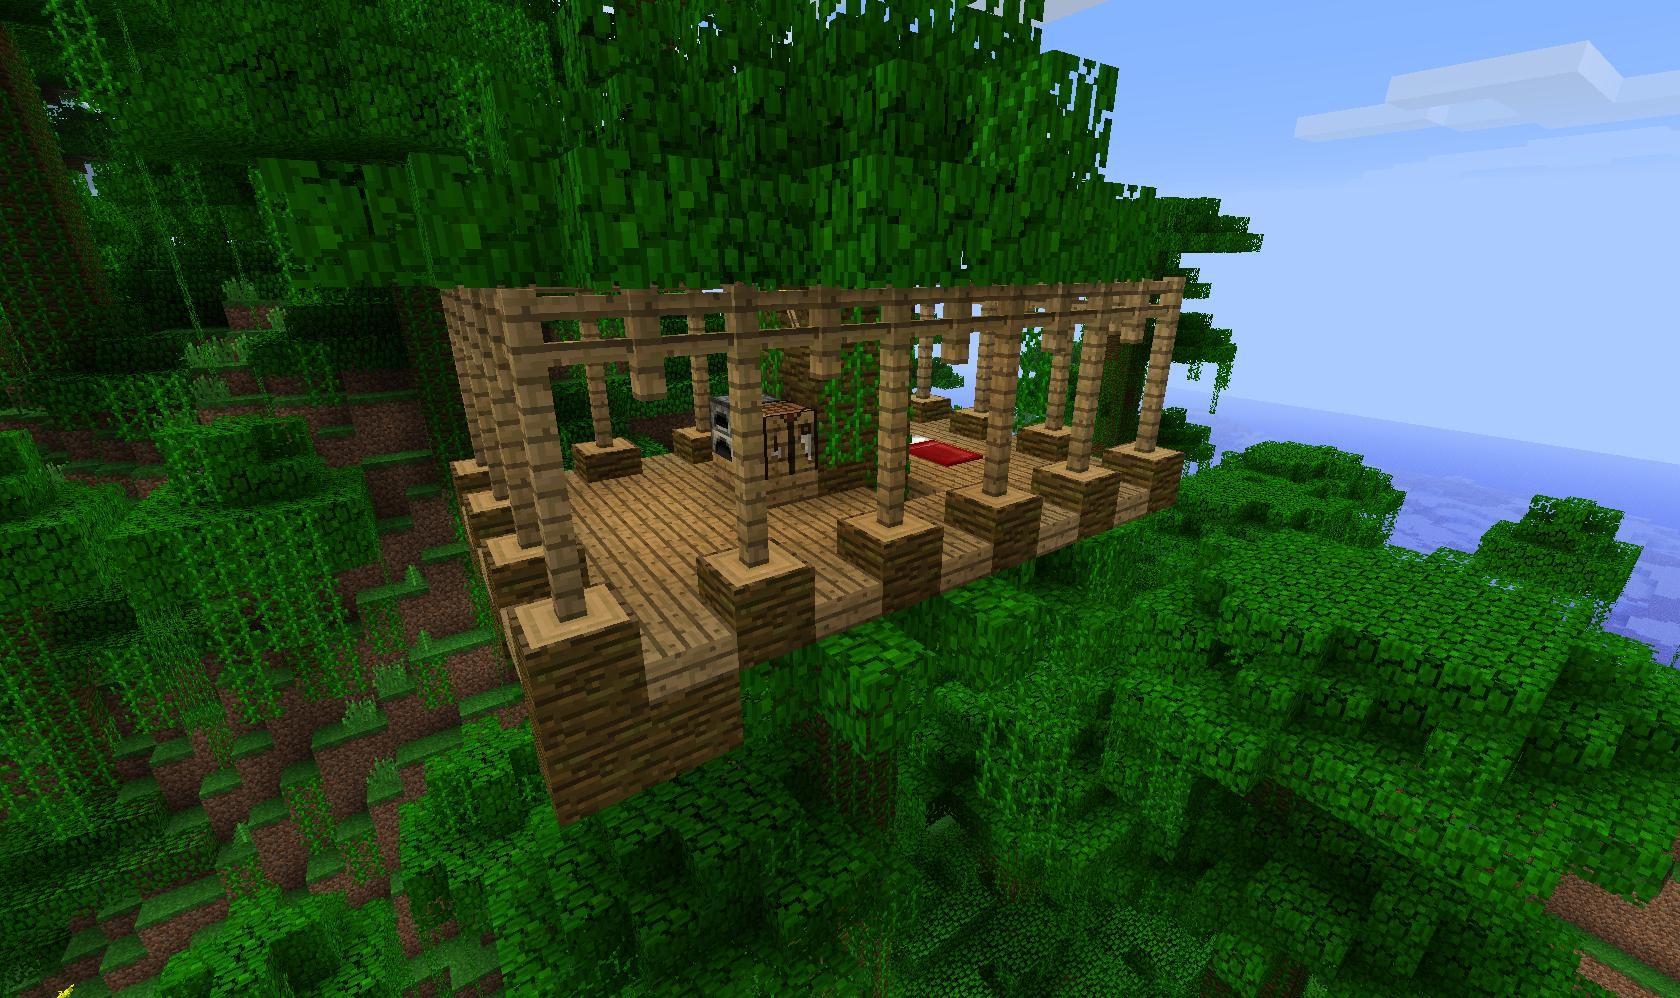 Jungle biome home ideas screenshots show your creation minecraft forum also rh co pinterest